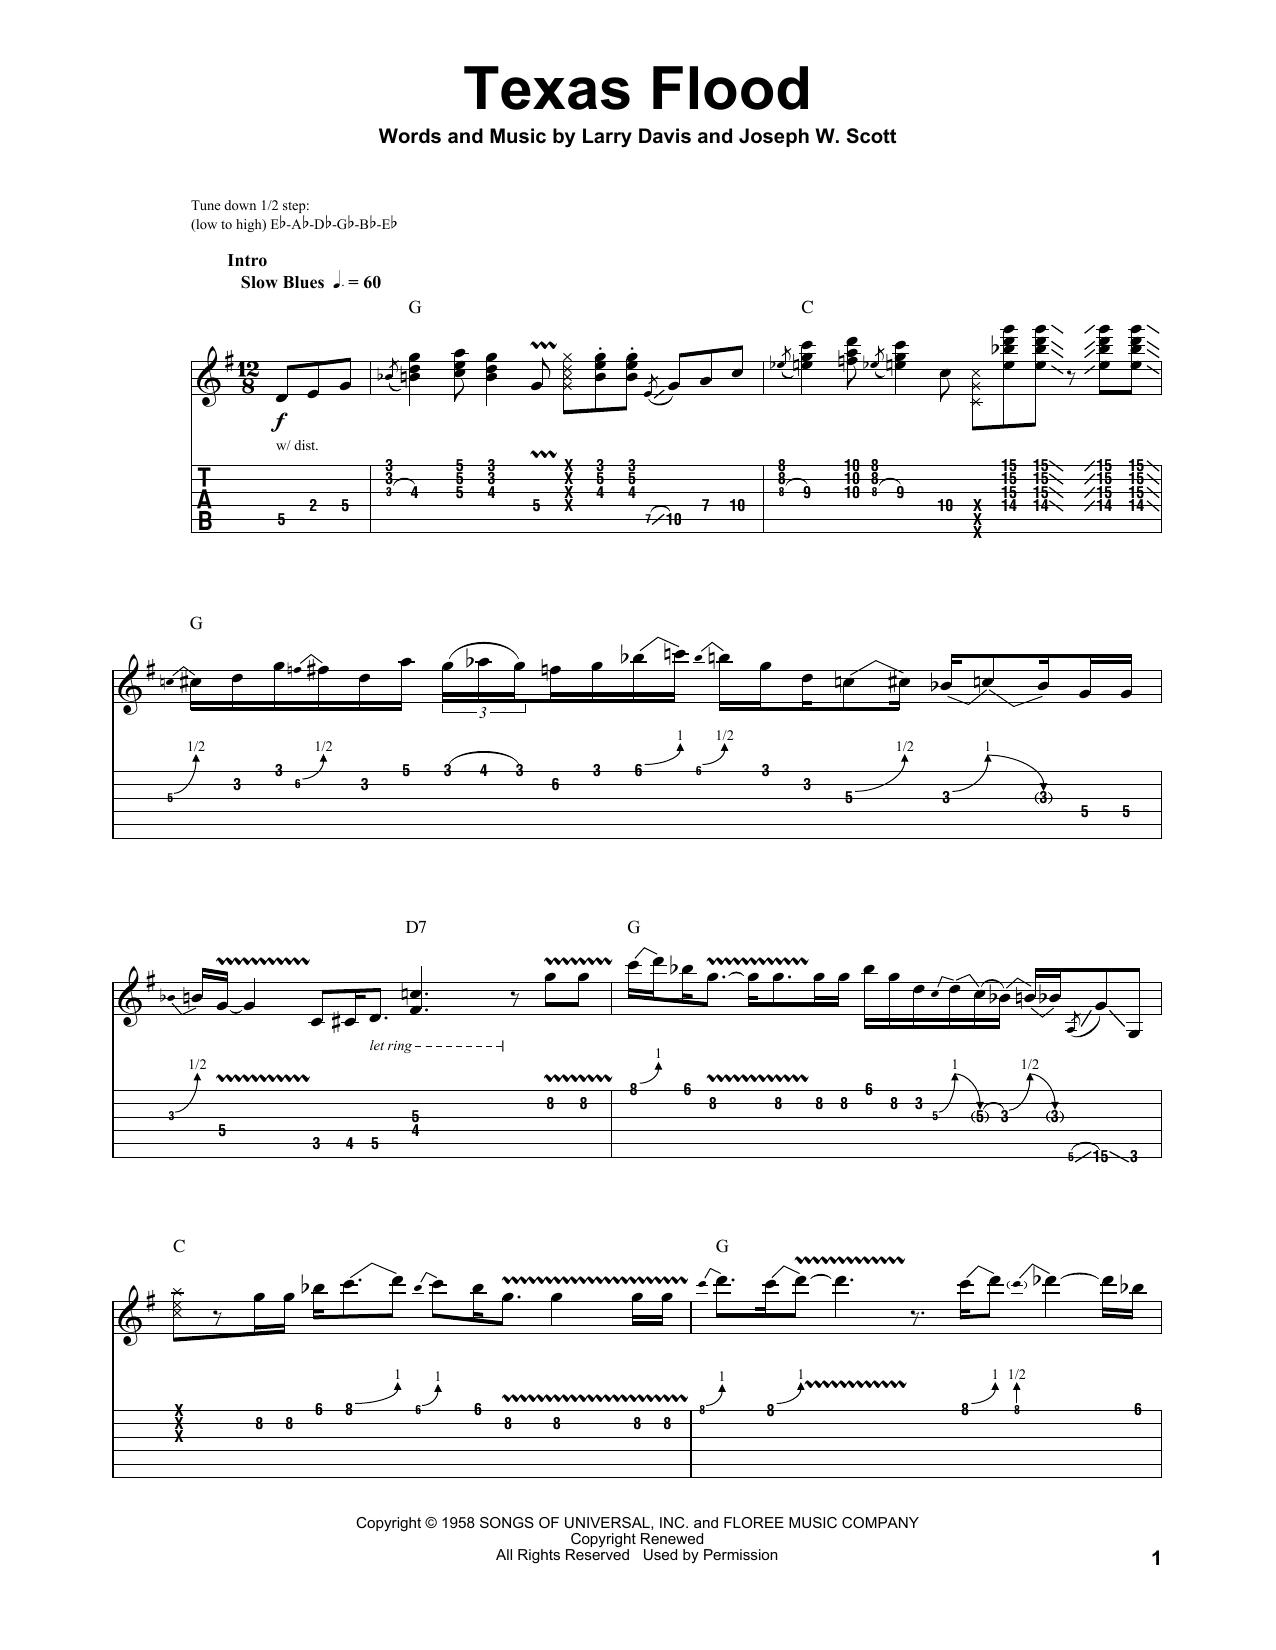 STEVIE RAY VAUGHAN DRUM PLAY-ALONG SHEET MUSIC SONG BOOK